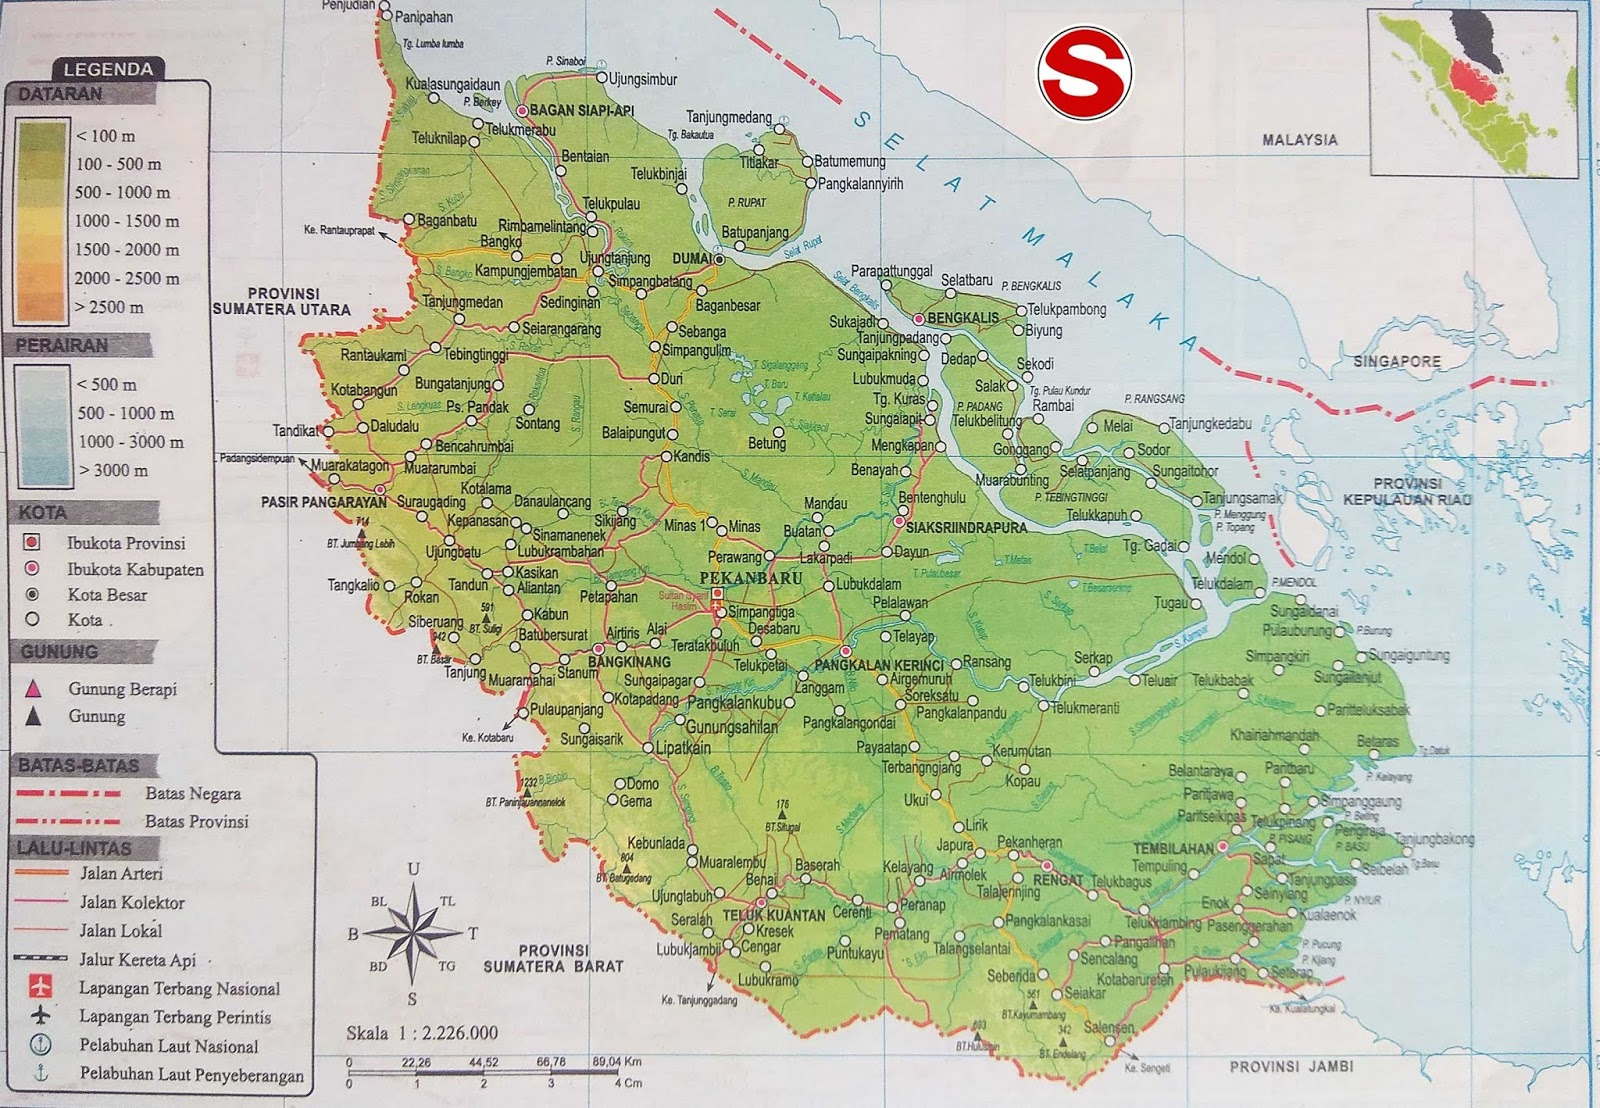 Gambar Peta Provinsi Riau Lengkap Penjelasannya